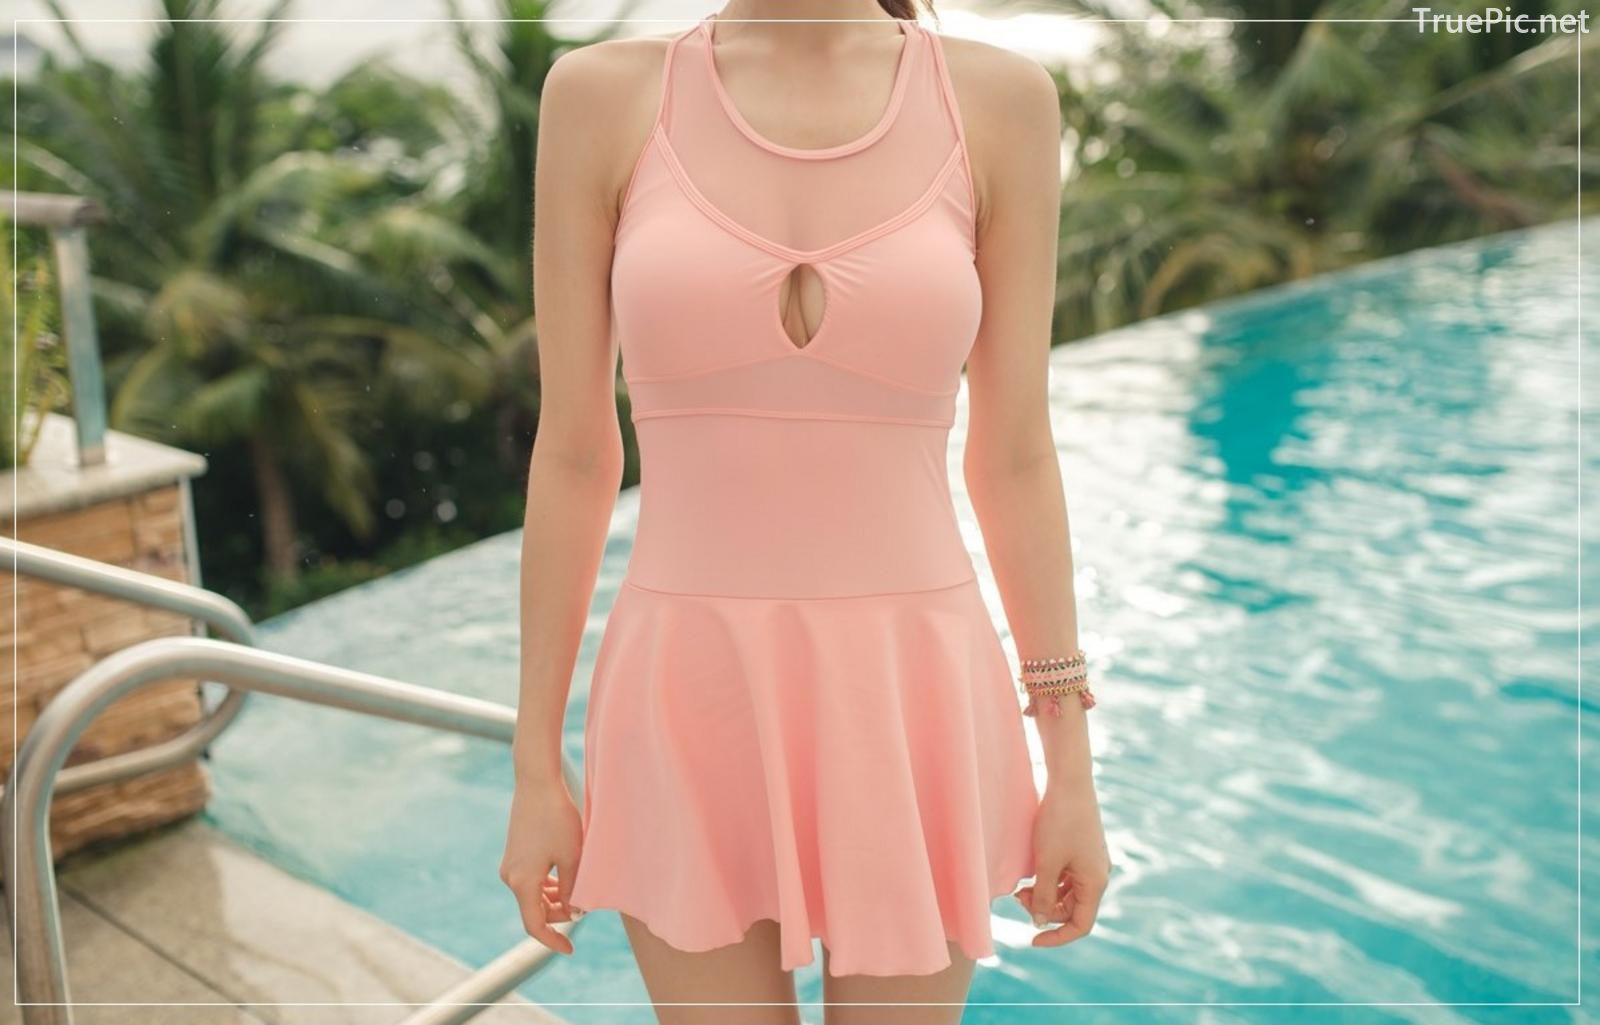 Korean model fashion - Park Jeong Yoon - Amanda One Piece Swimsuit - Picture 3